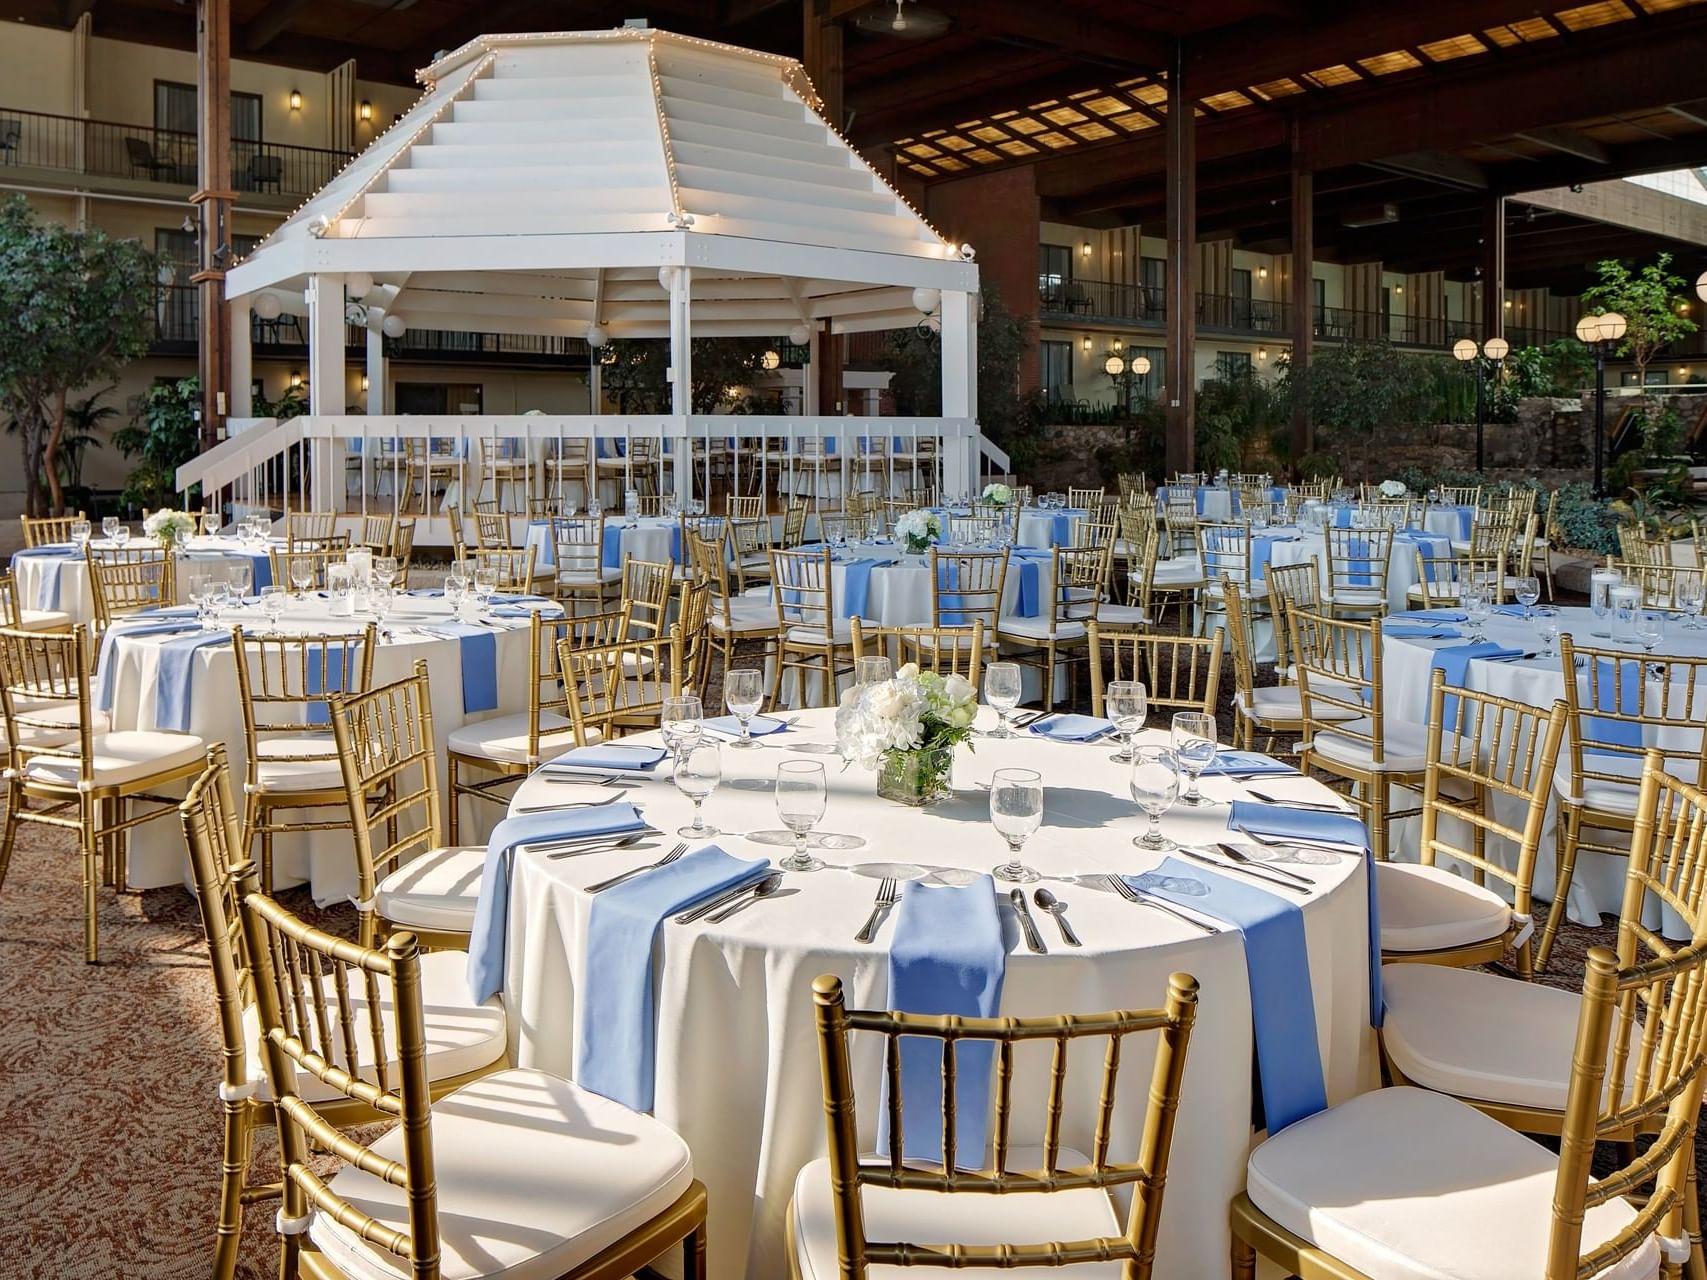 Wedding venue tables in atrium